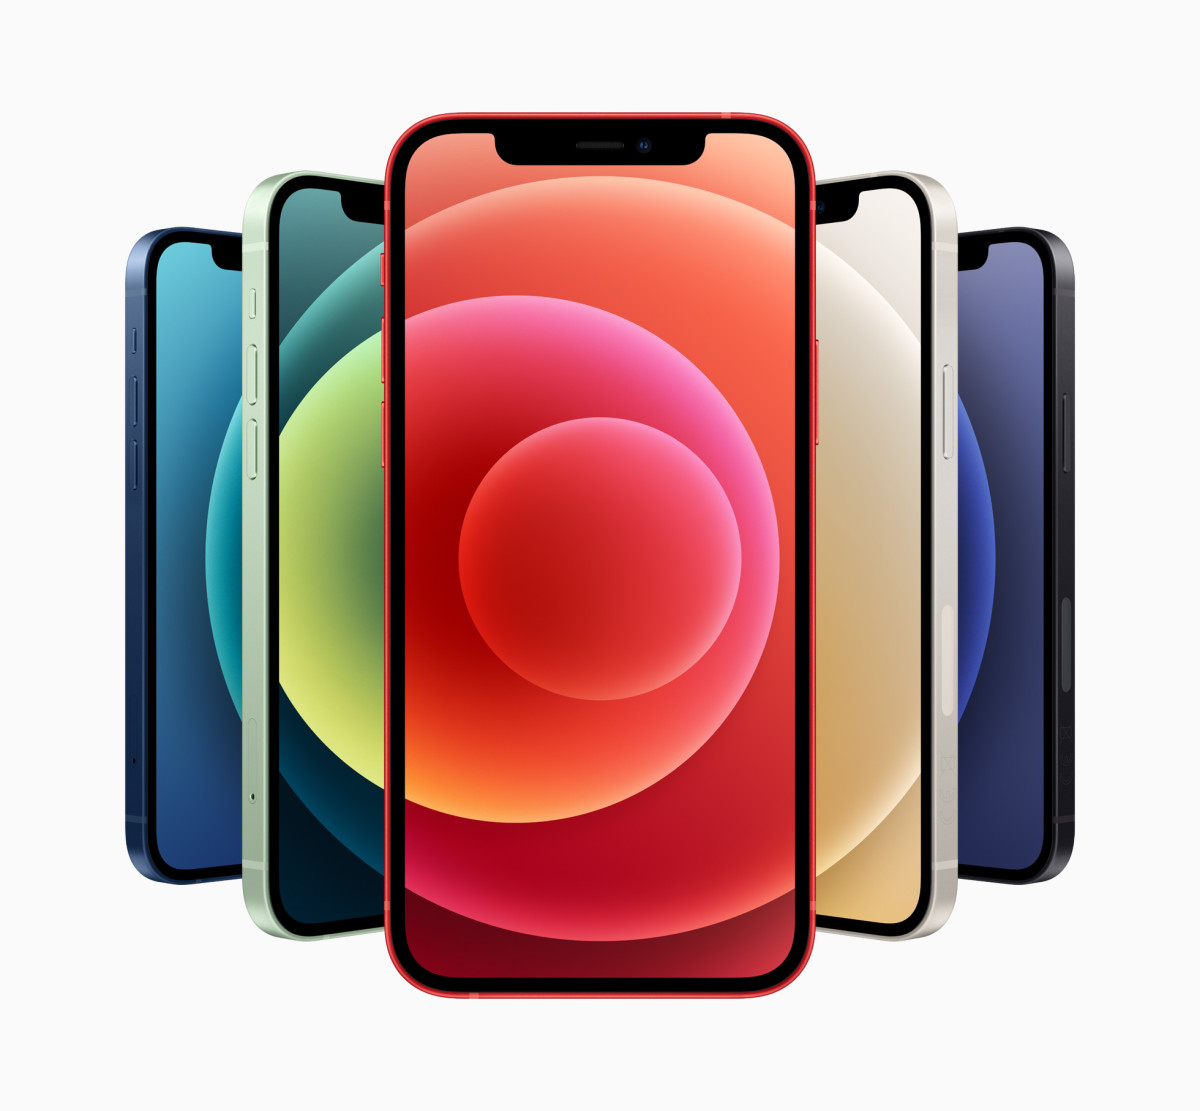 apple_iphone-12_new-design_10132020